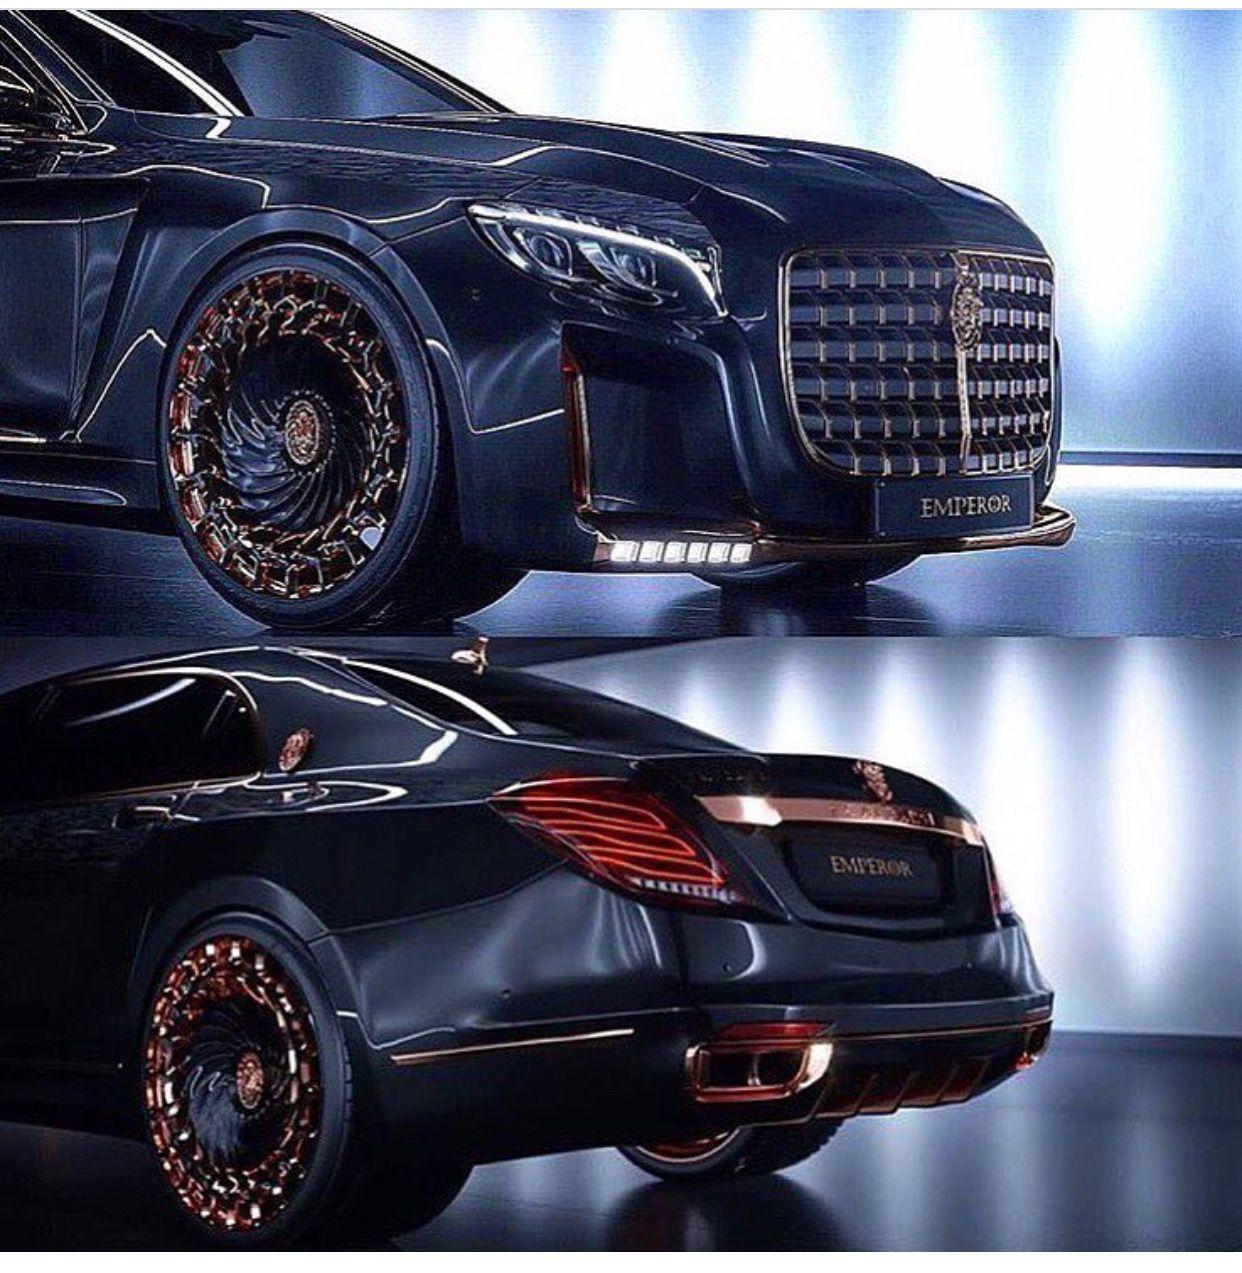 Scaldarsi motors maybach based 1 5 million emperor i is a sight to - Mercedes Maybach Emperor